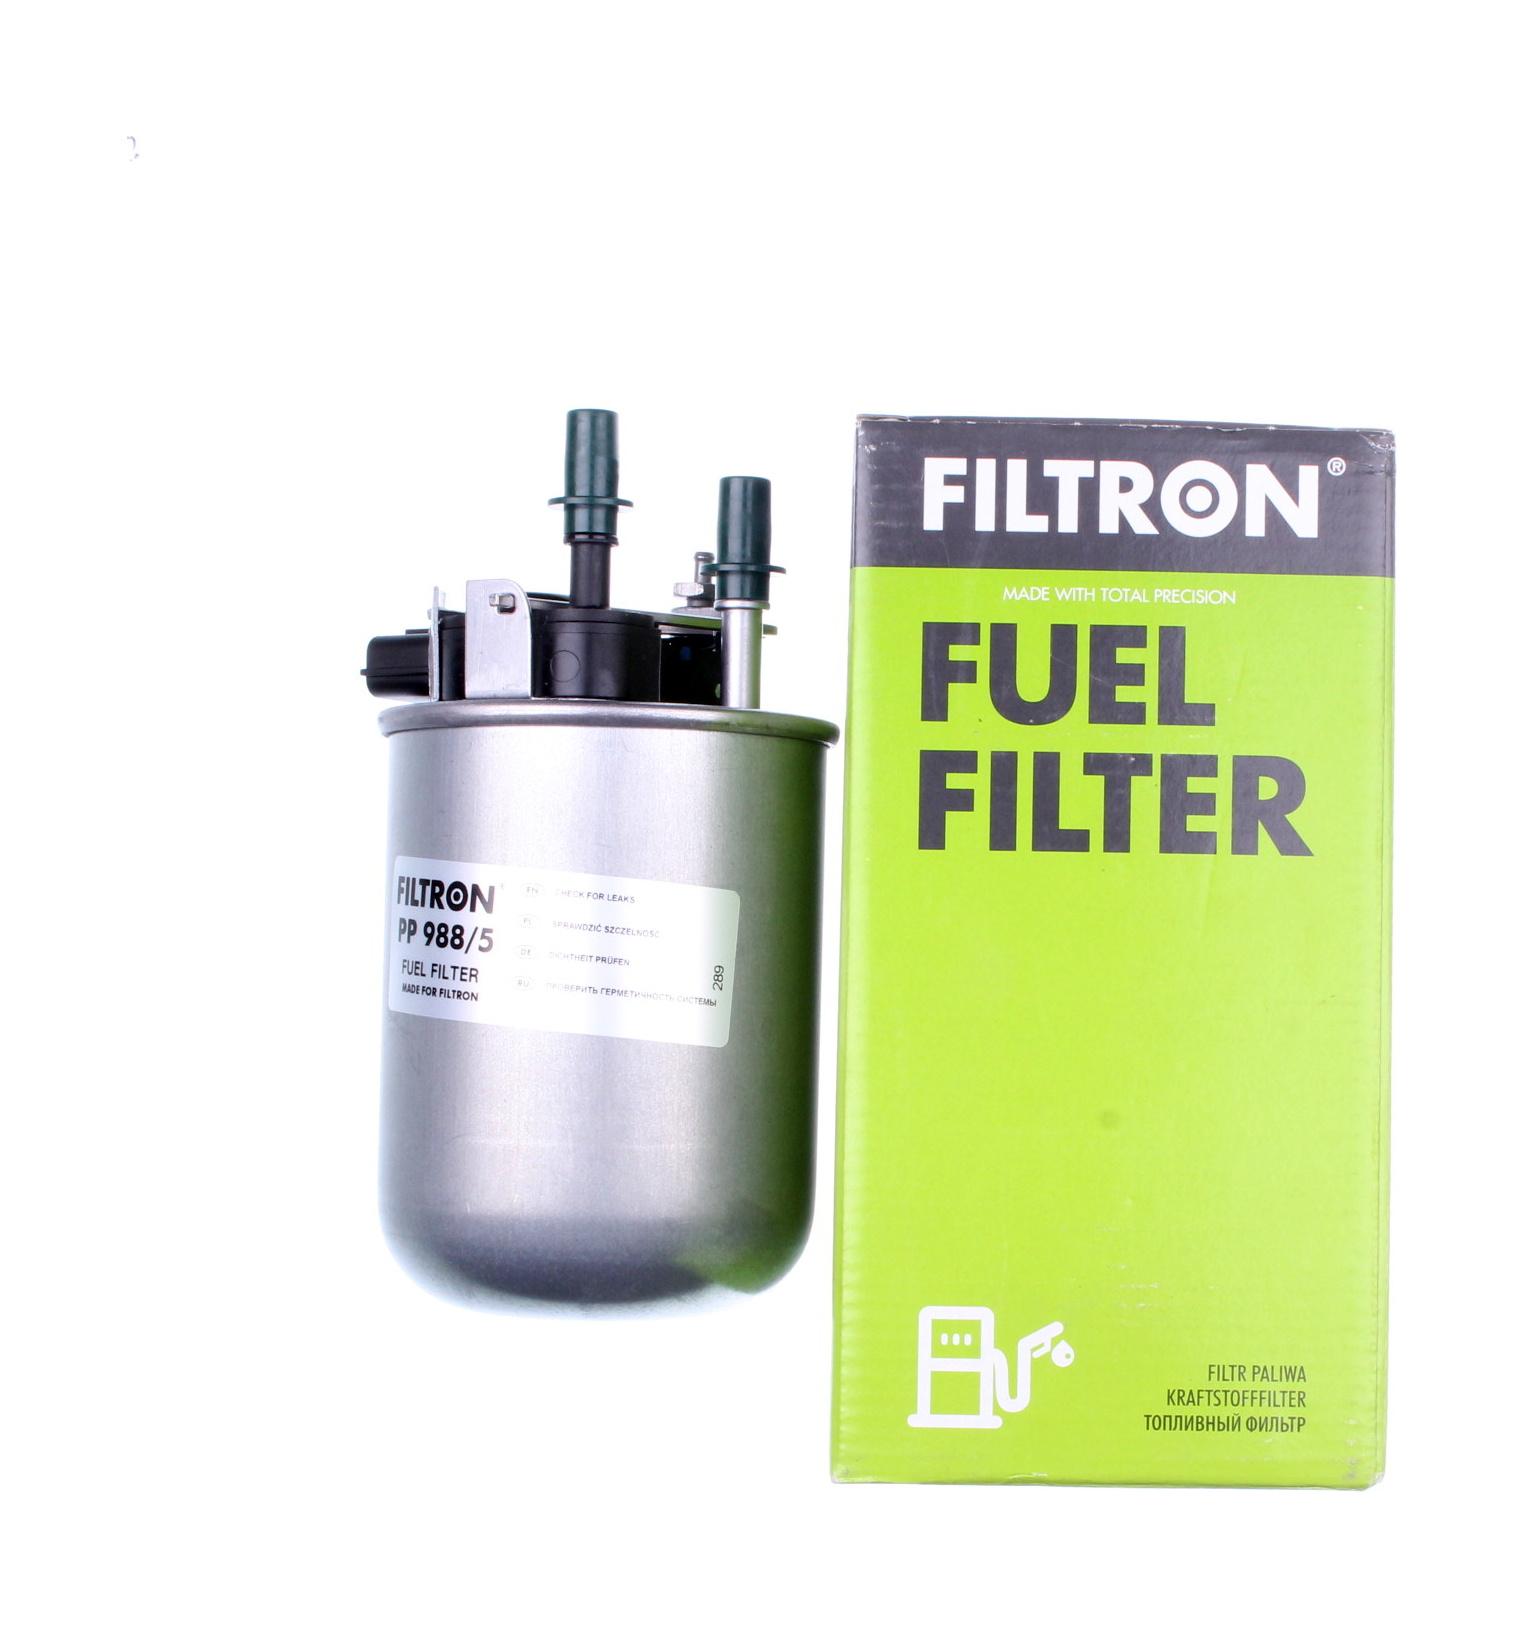 Filtr Paliwa